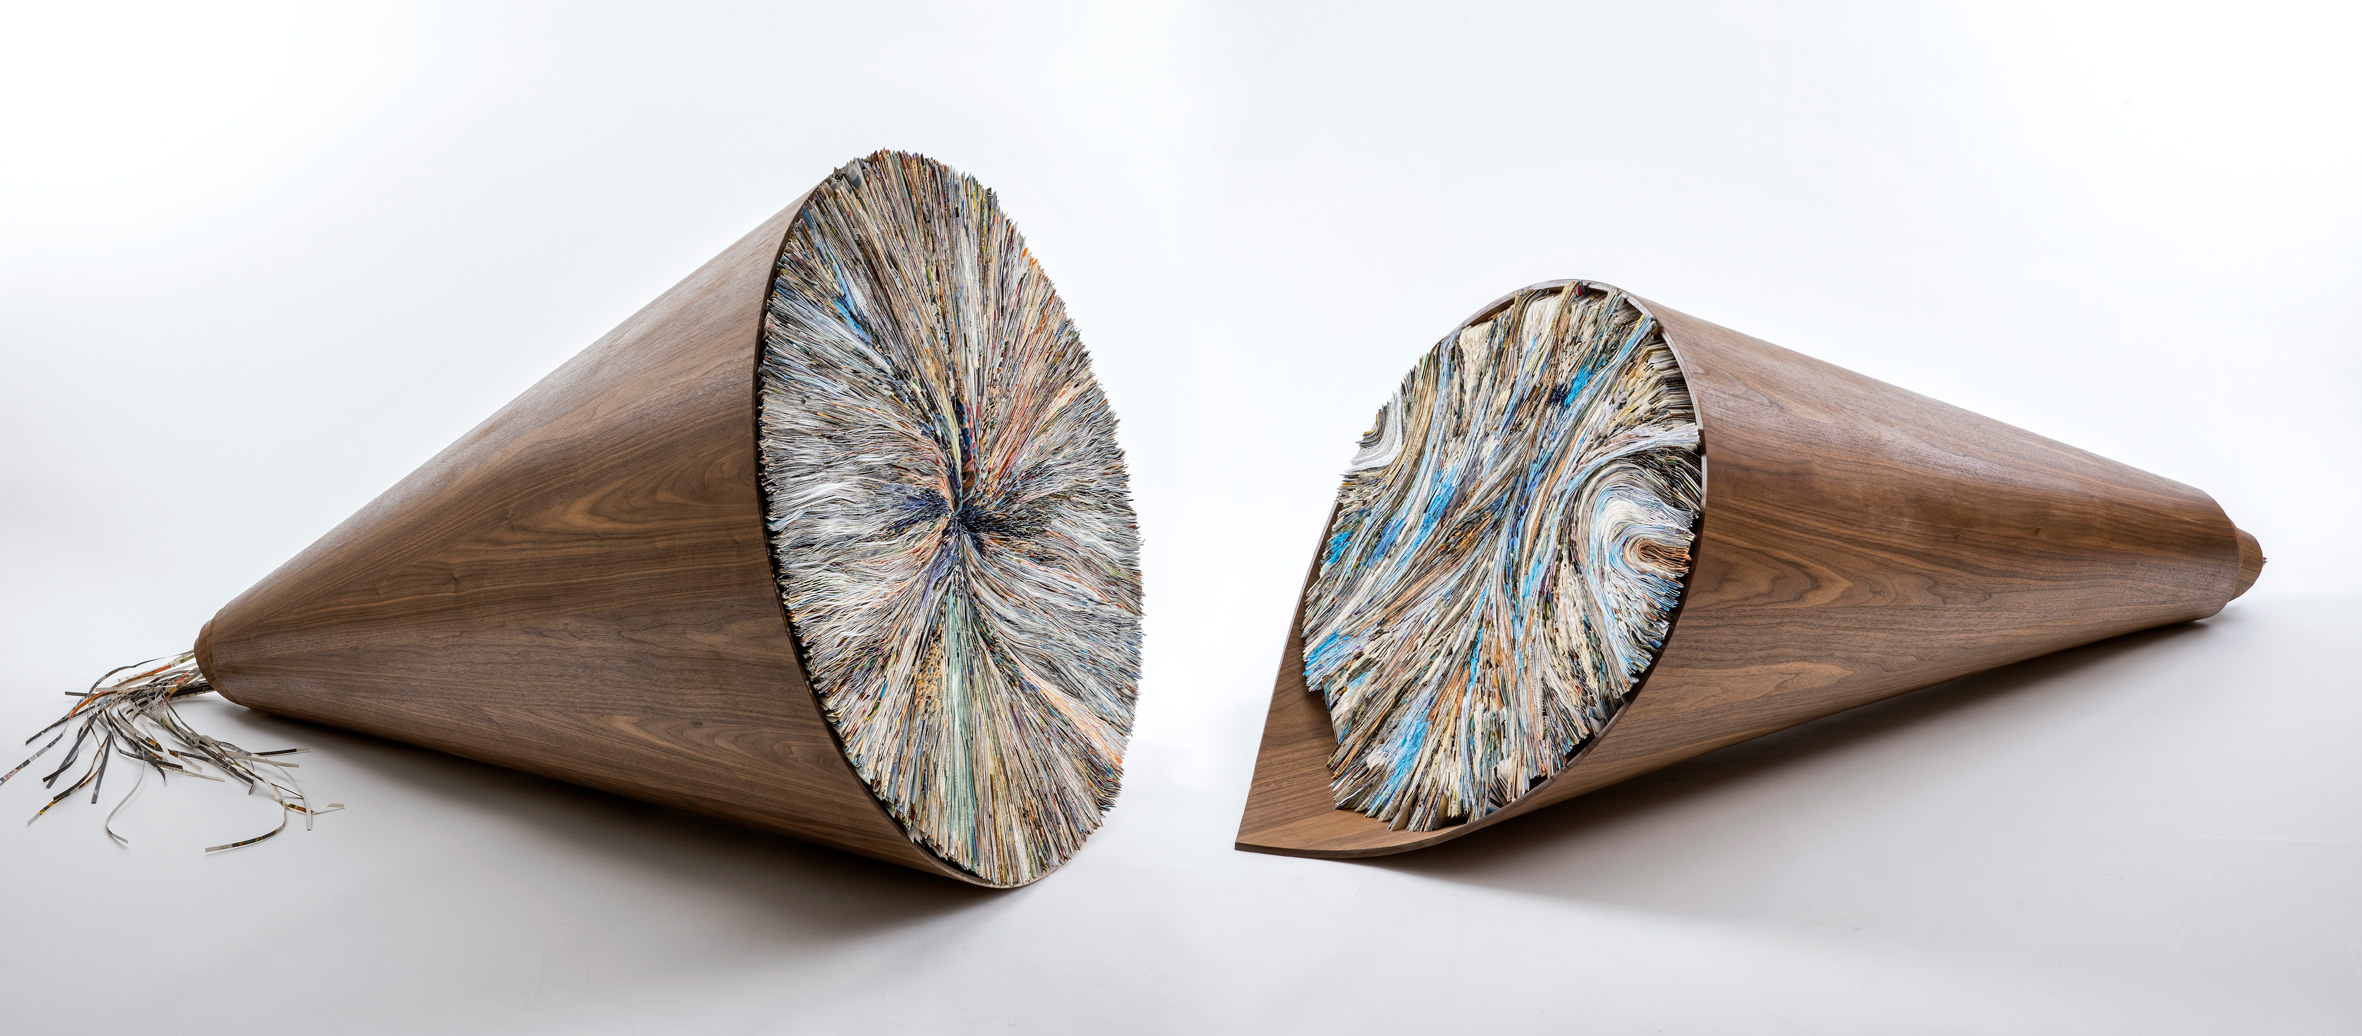 Untitled | Folded Paper & Kopf Wood